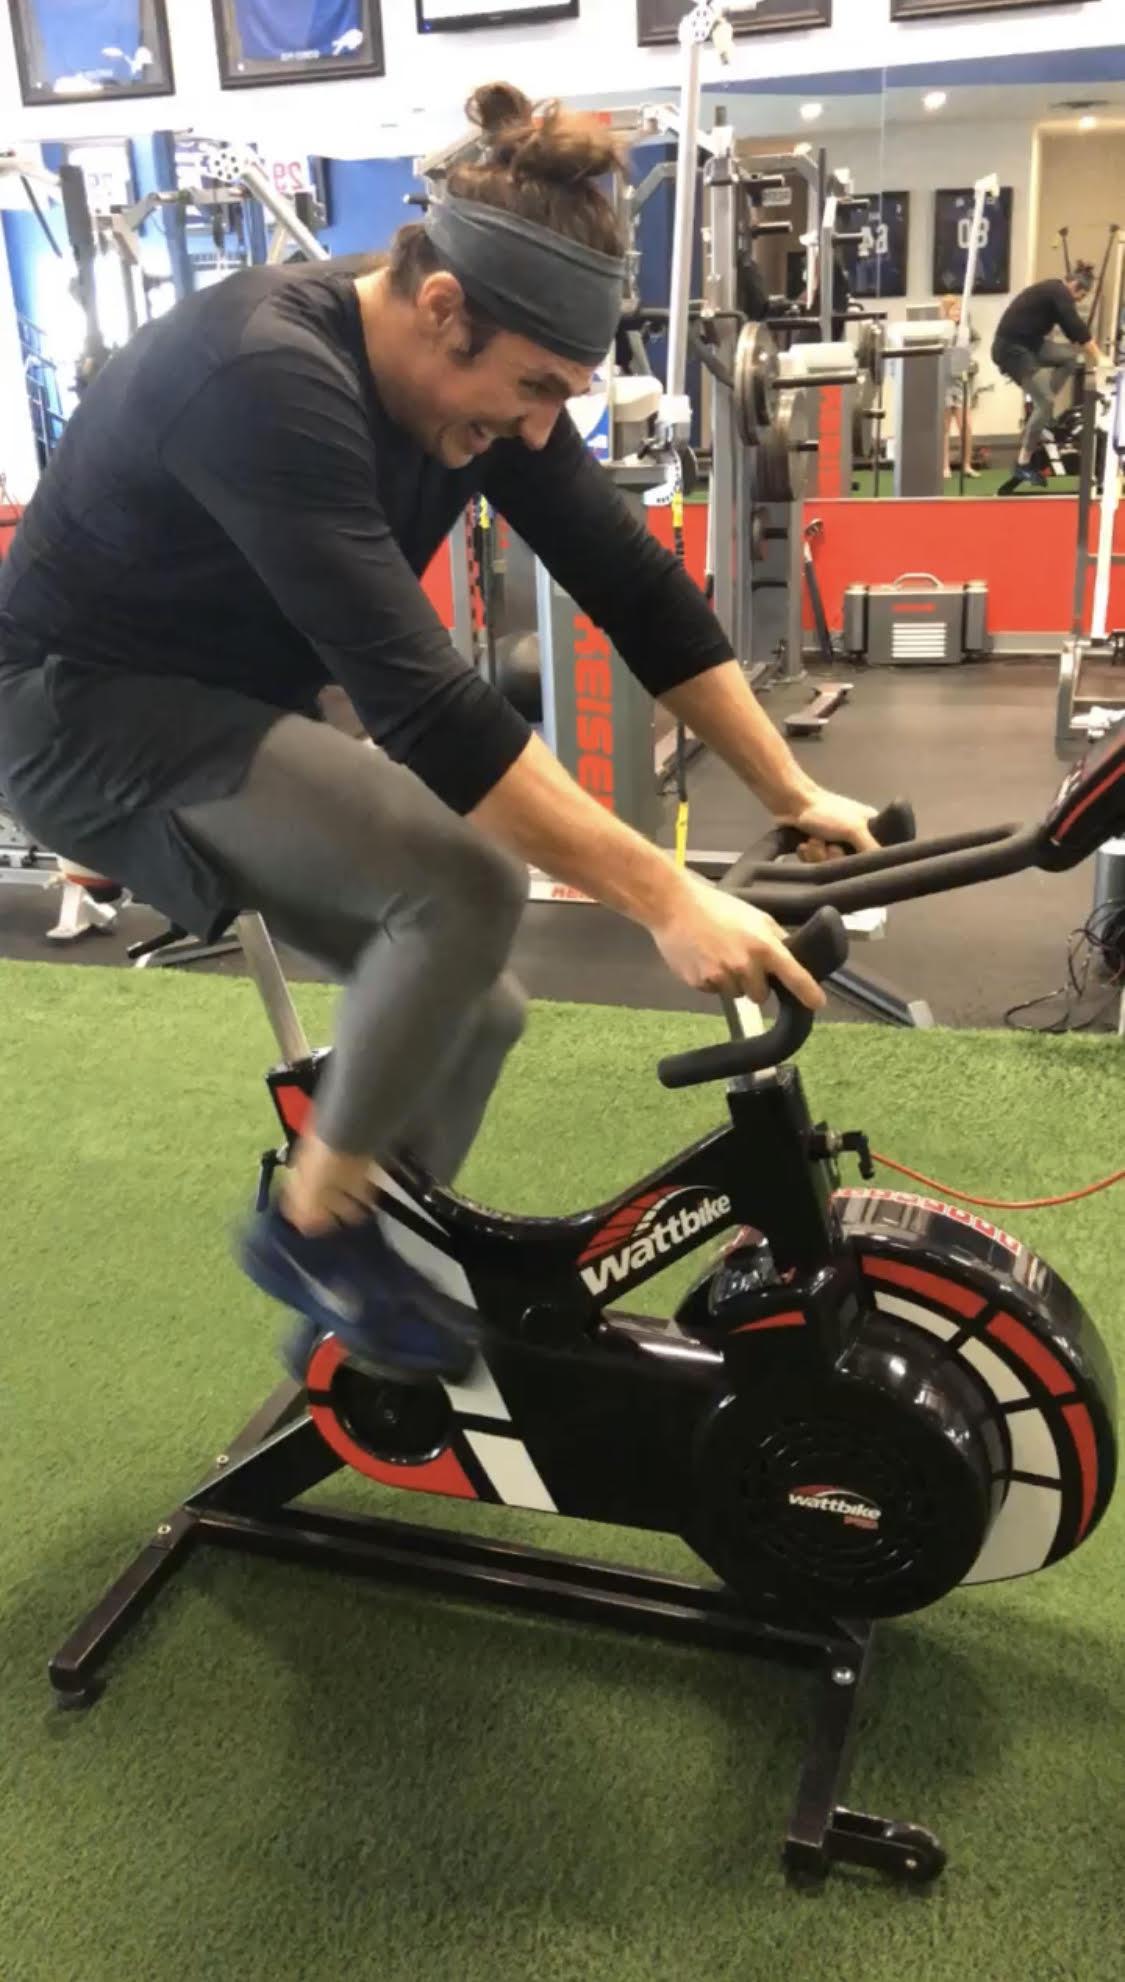 wattbike redefining Pro Sports